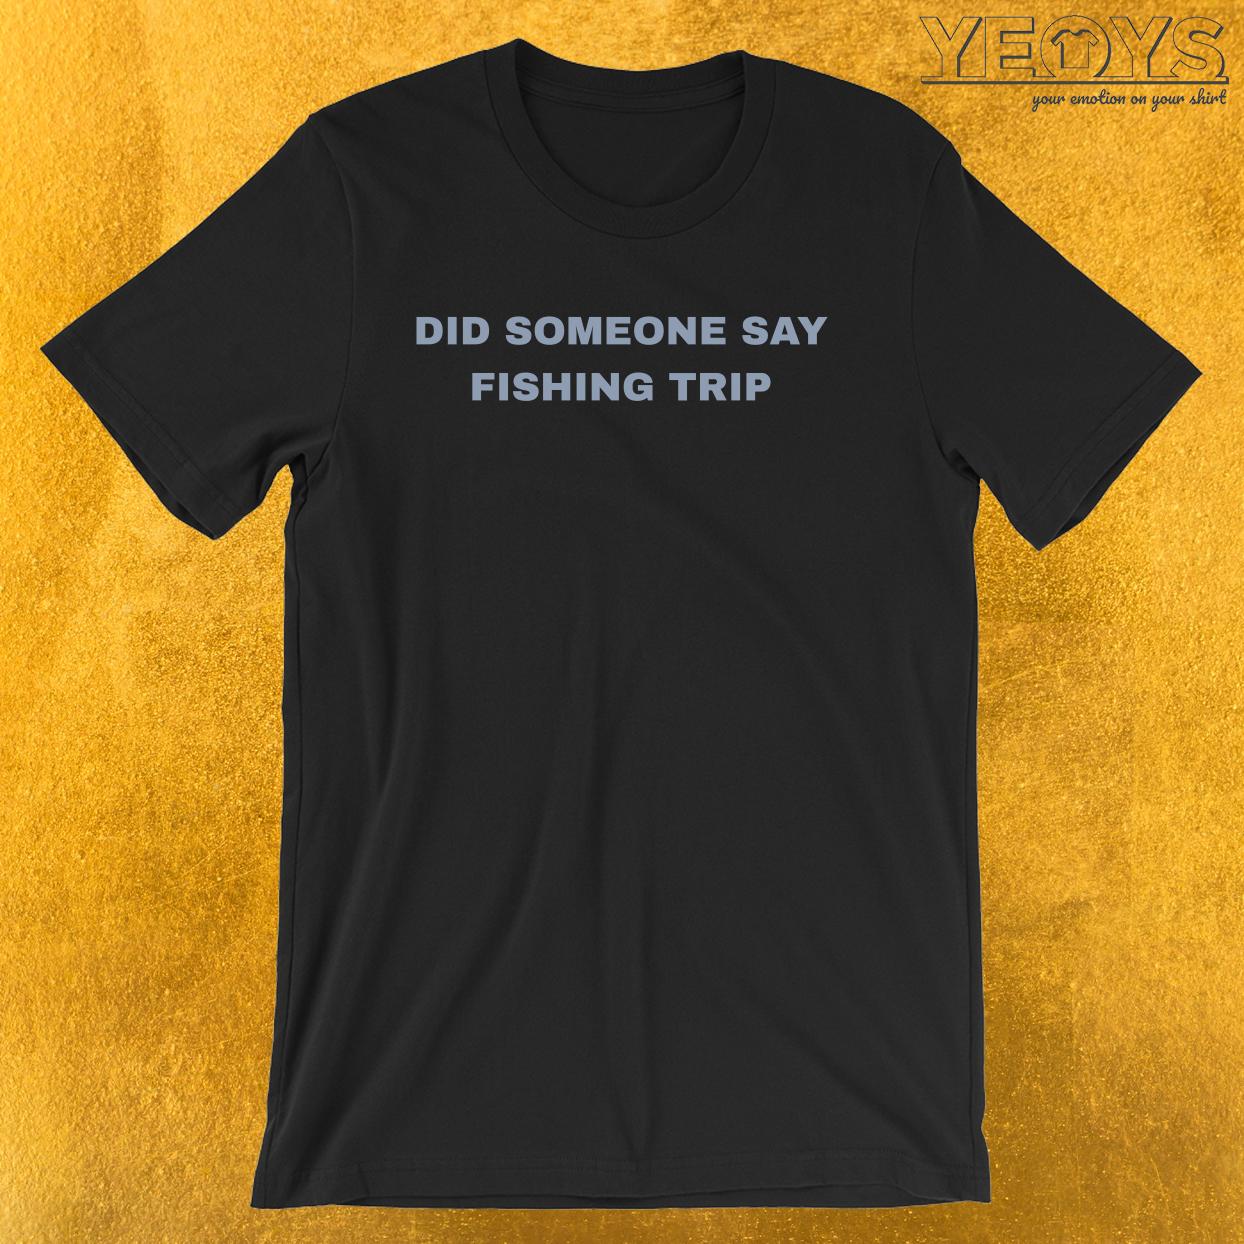 Lake & River Fishing – Did Someone Say Fishing Trip Tee